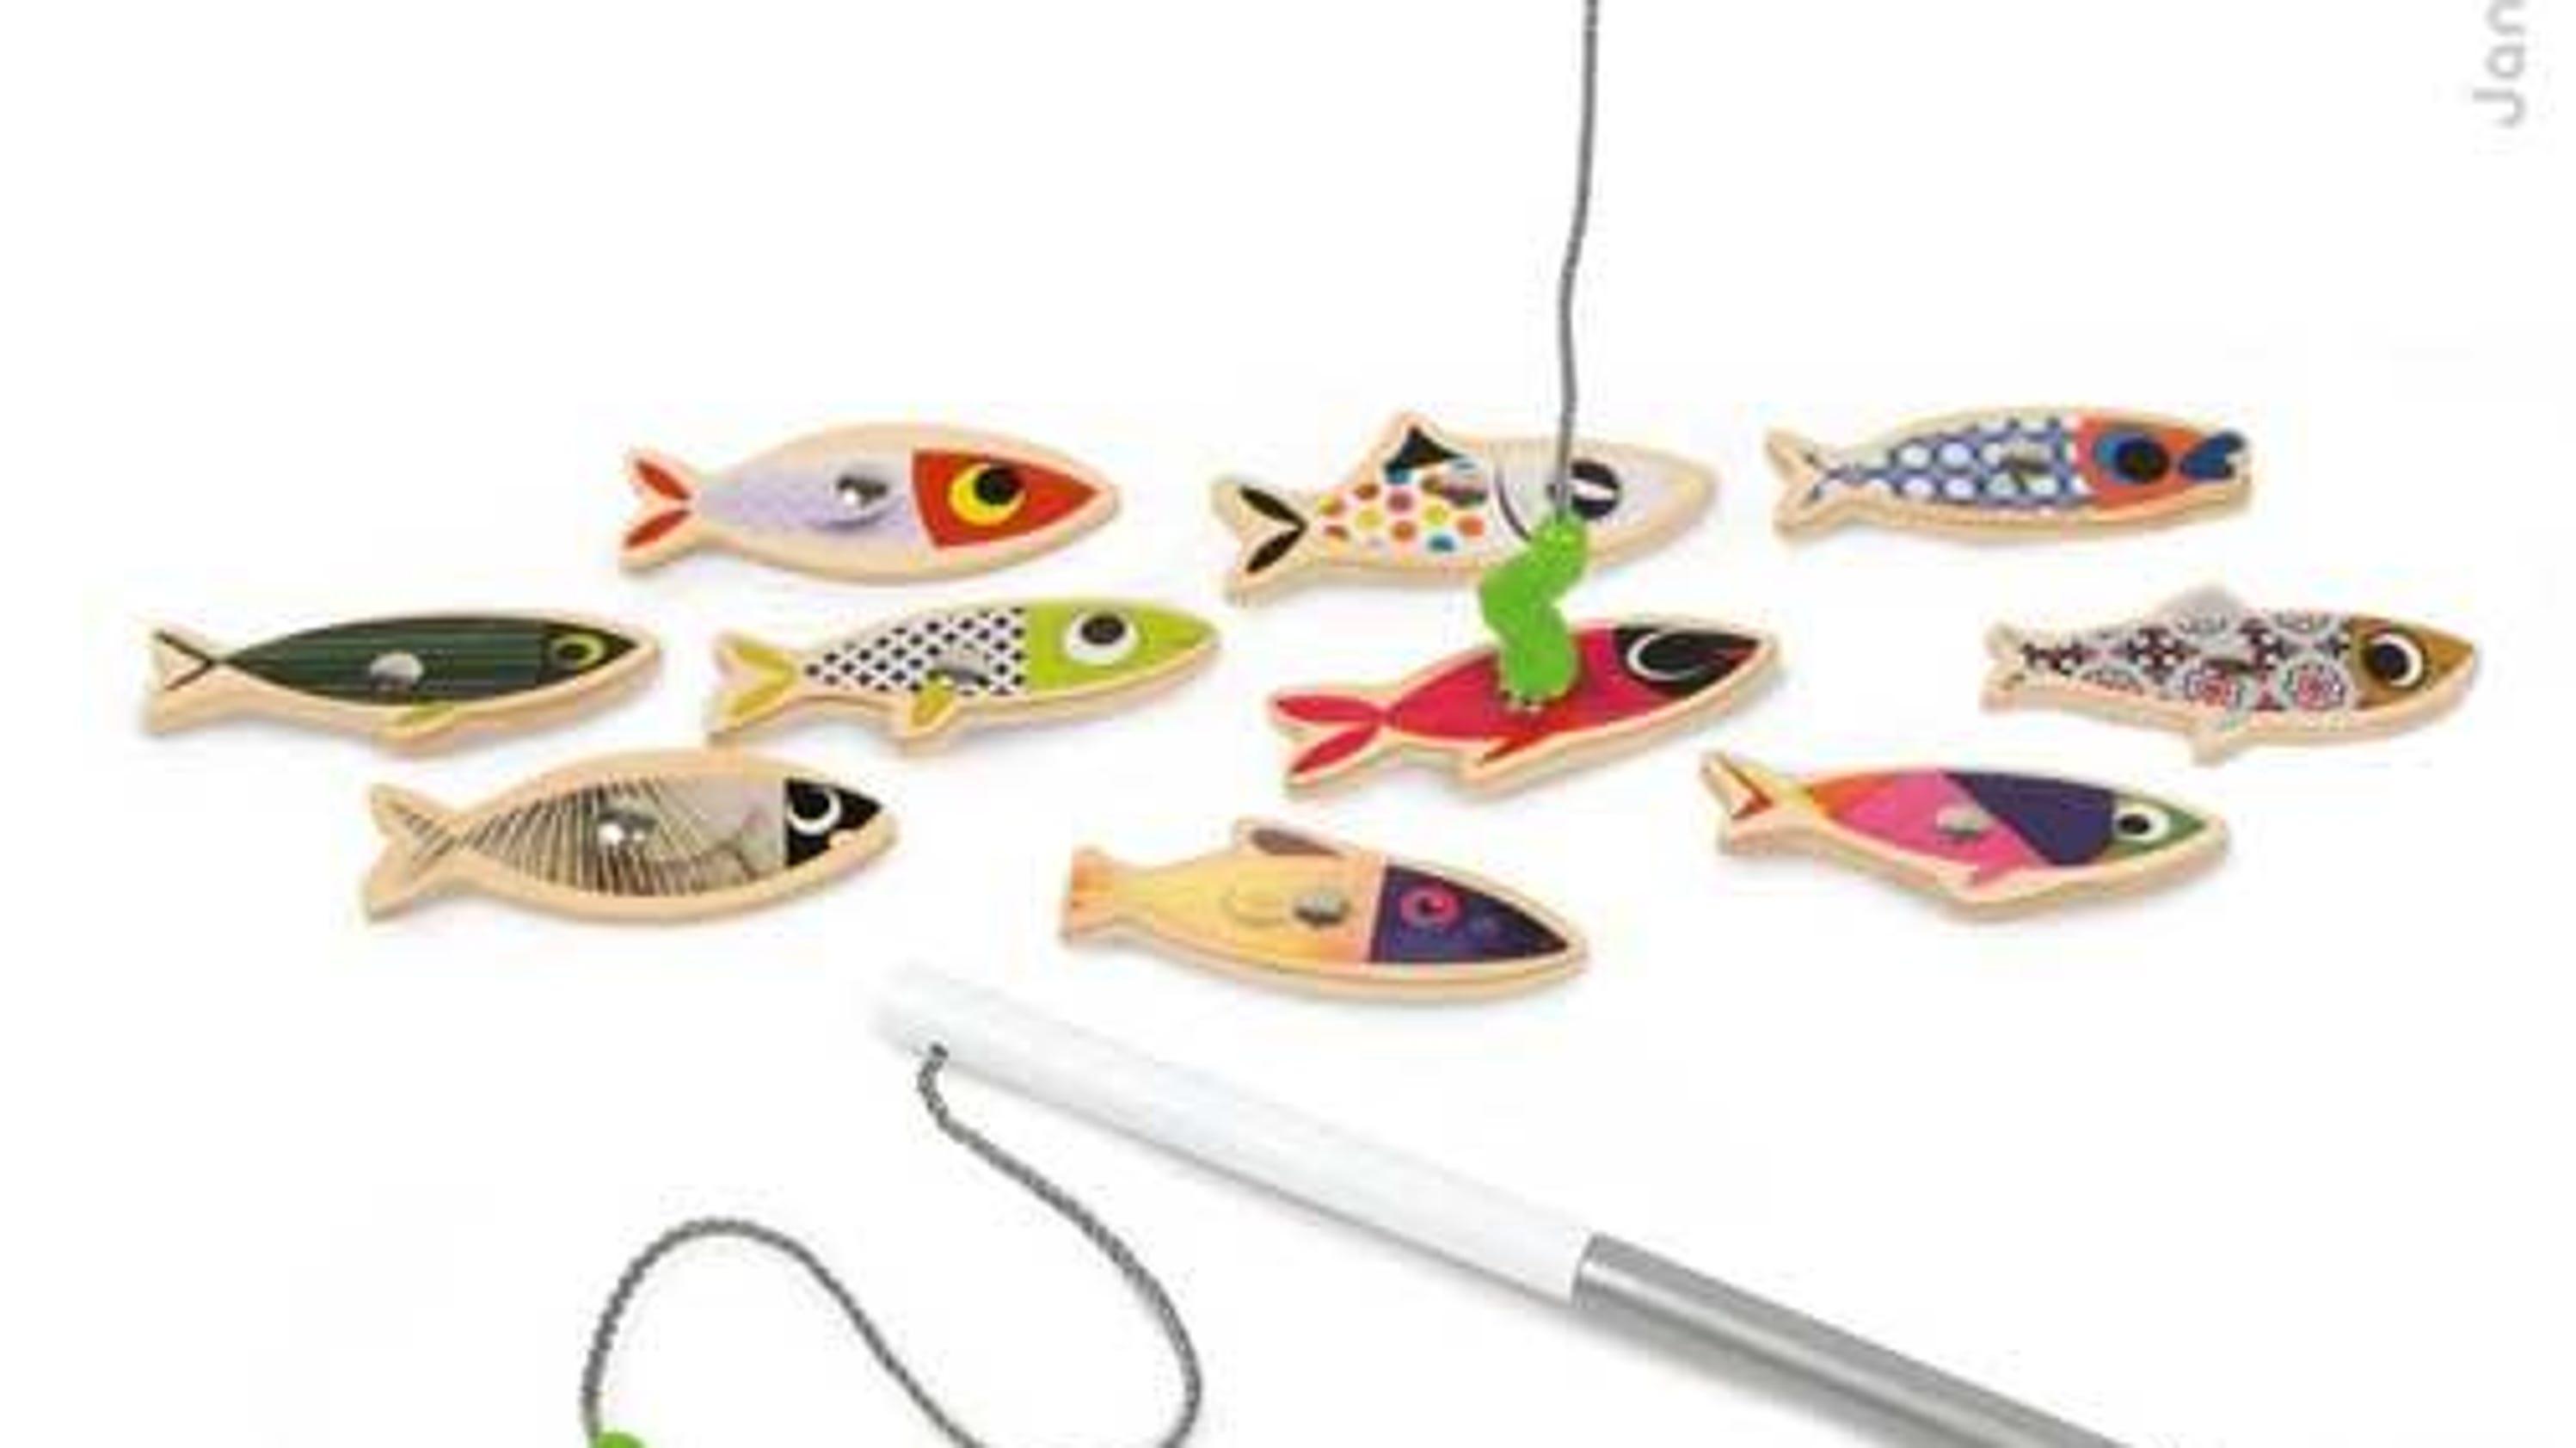 Toy fishing games endanger your kids